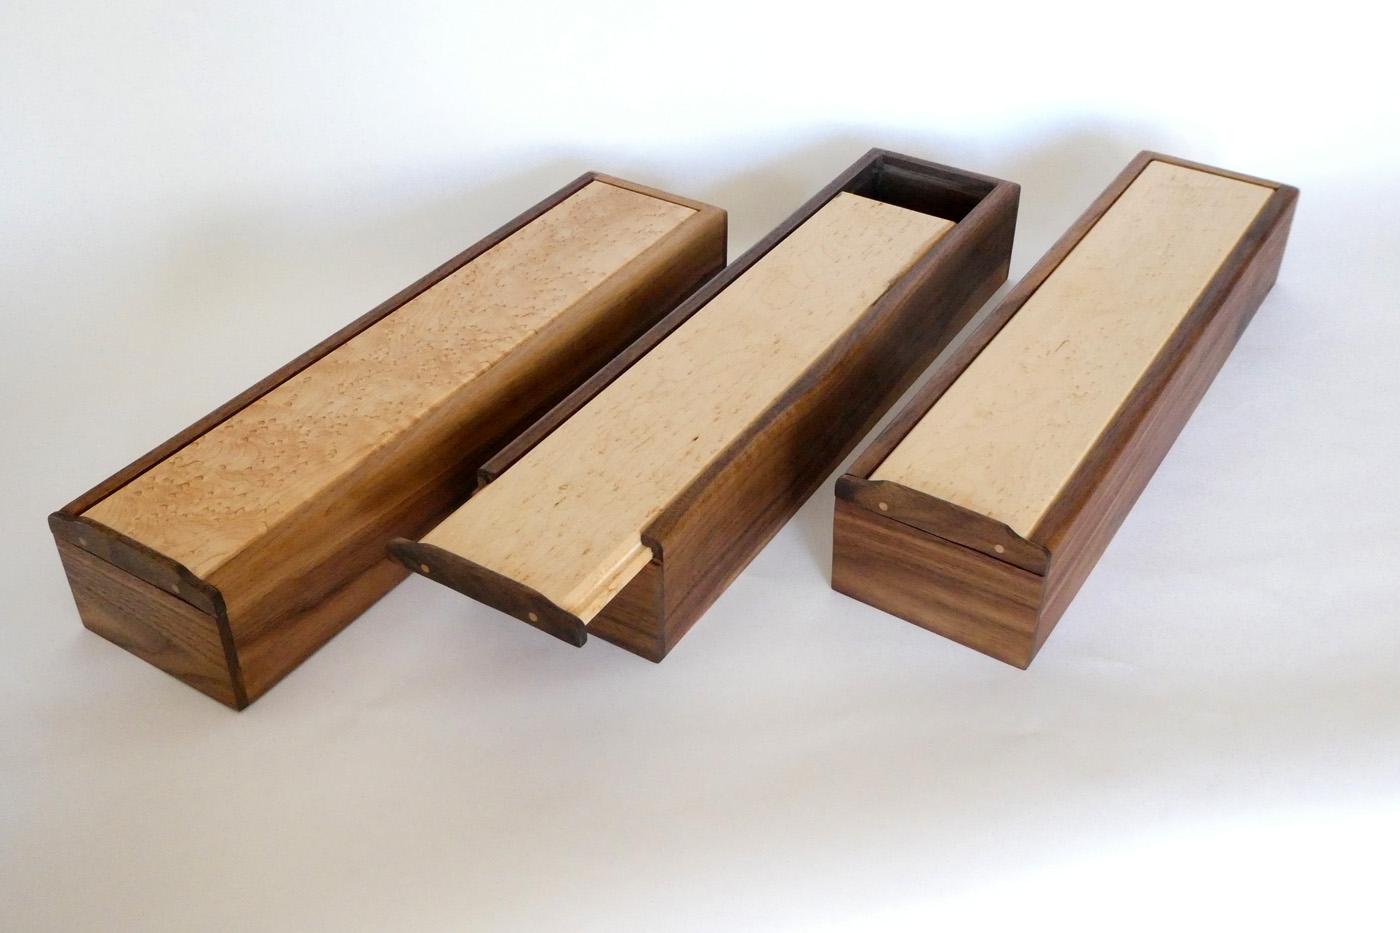 box-5.jpg